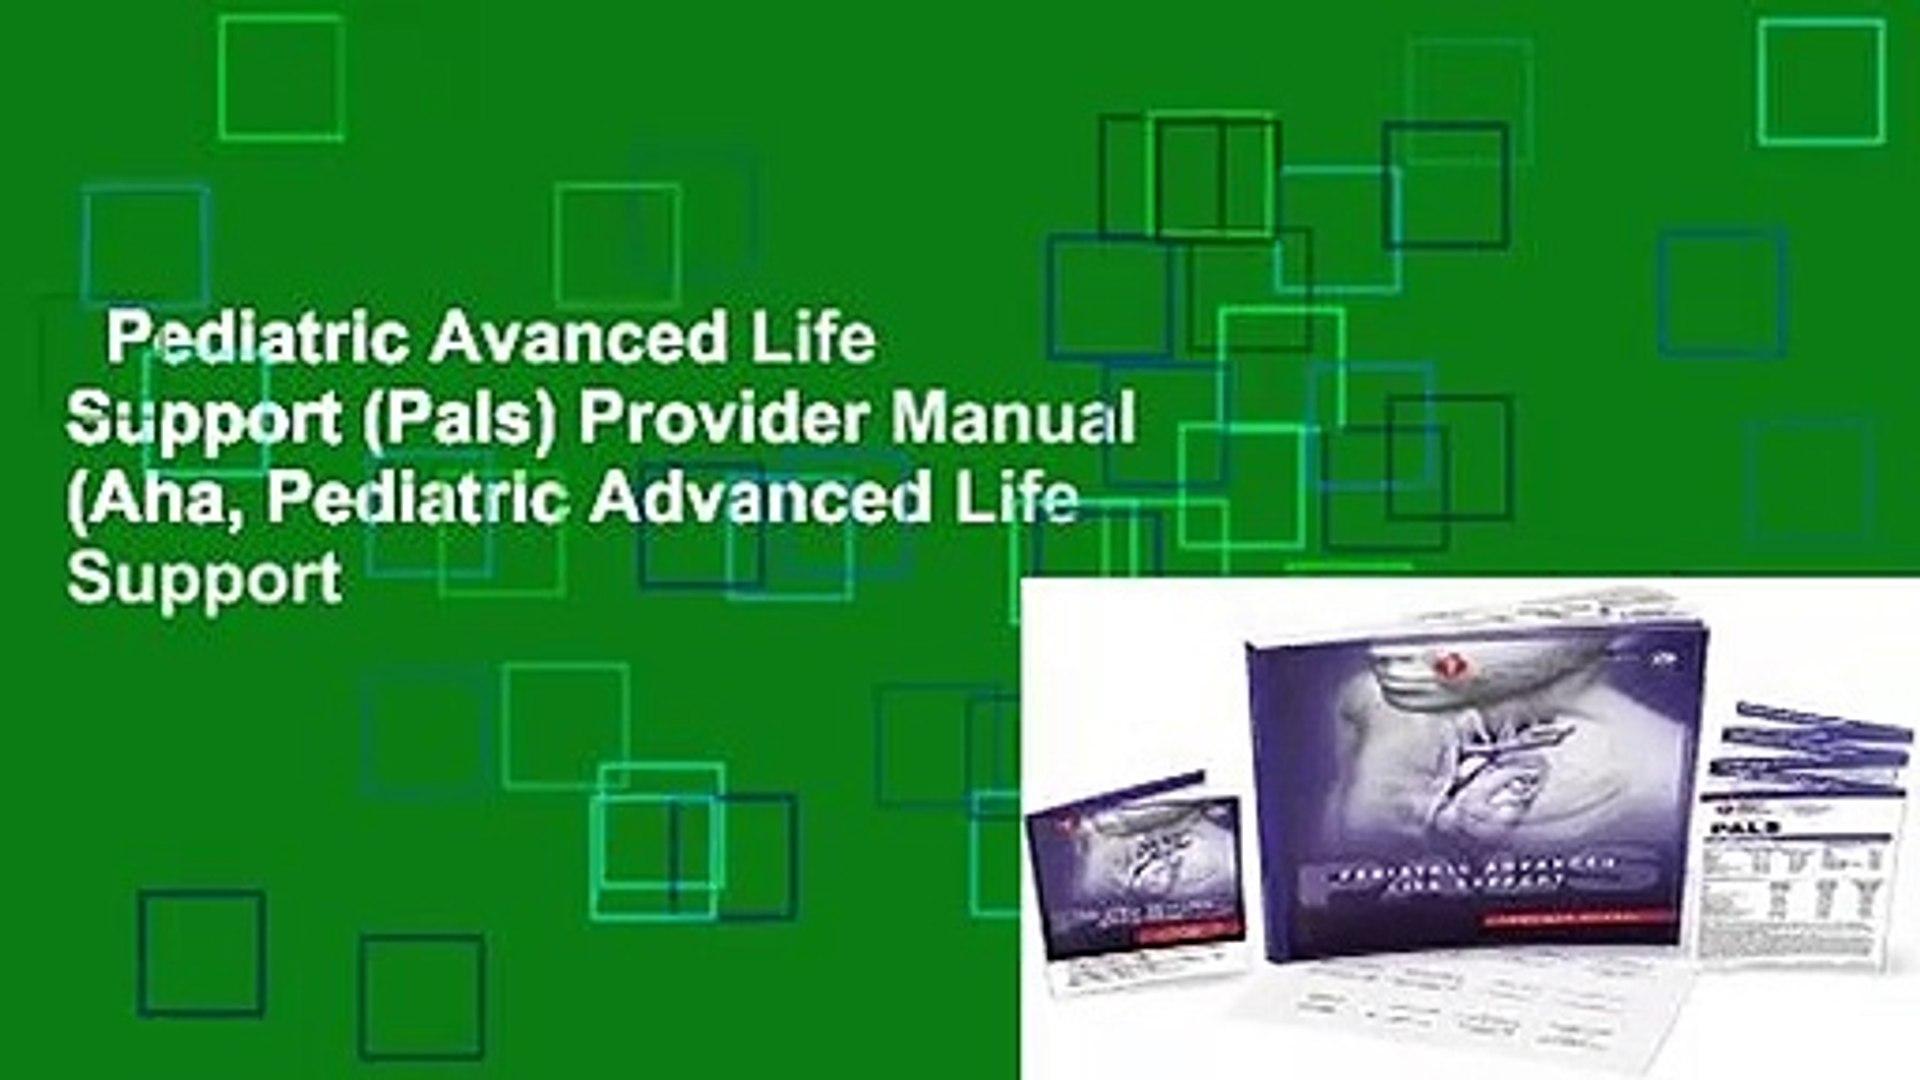 Pediatric Avanced Life Support (Pals) Provider Manual (Aha, Pediatric Advanced Life Support